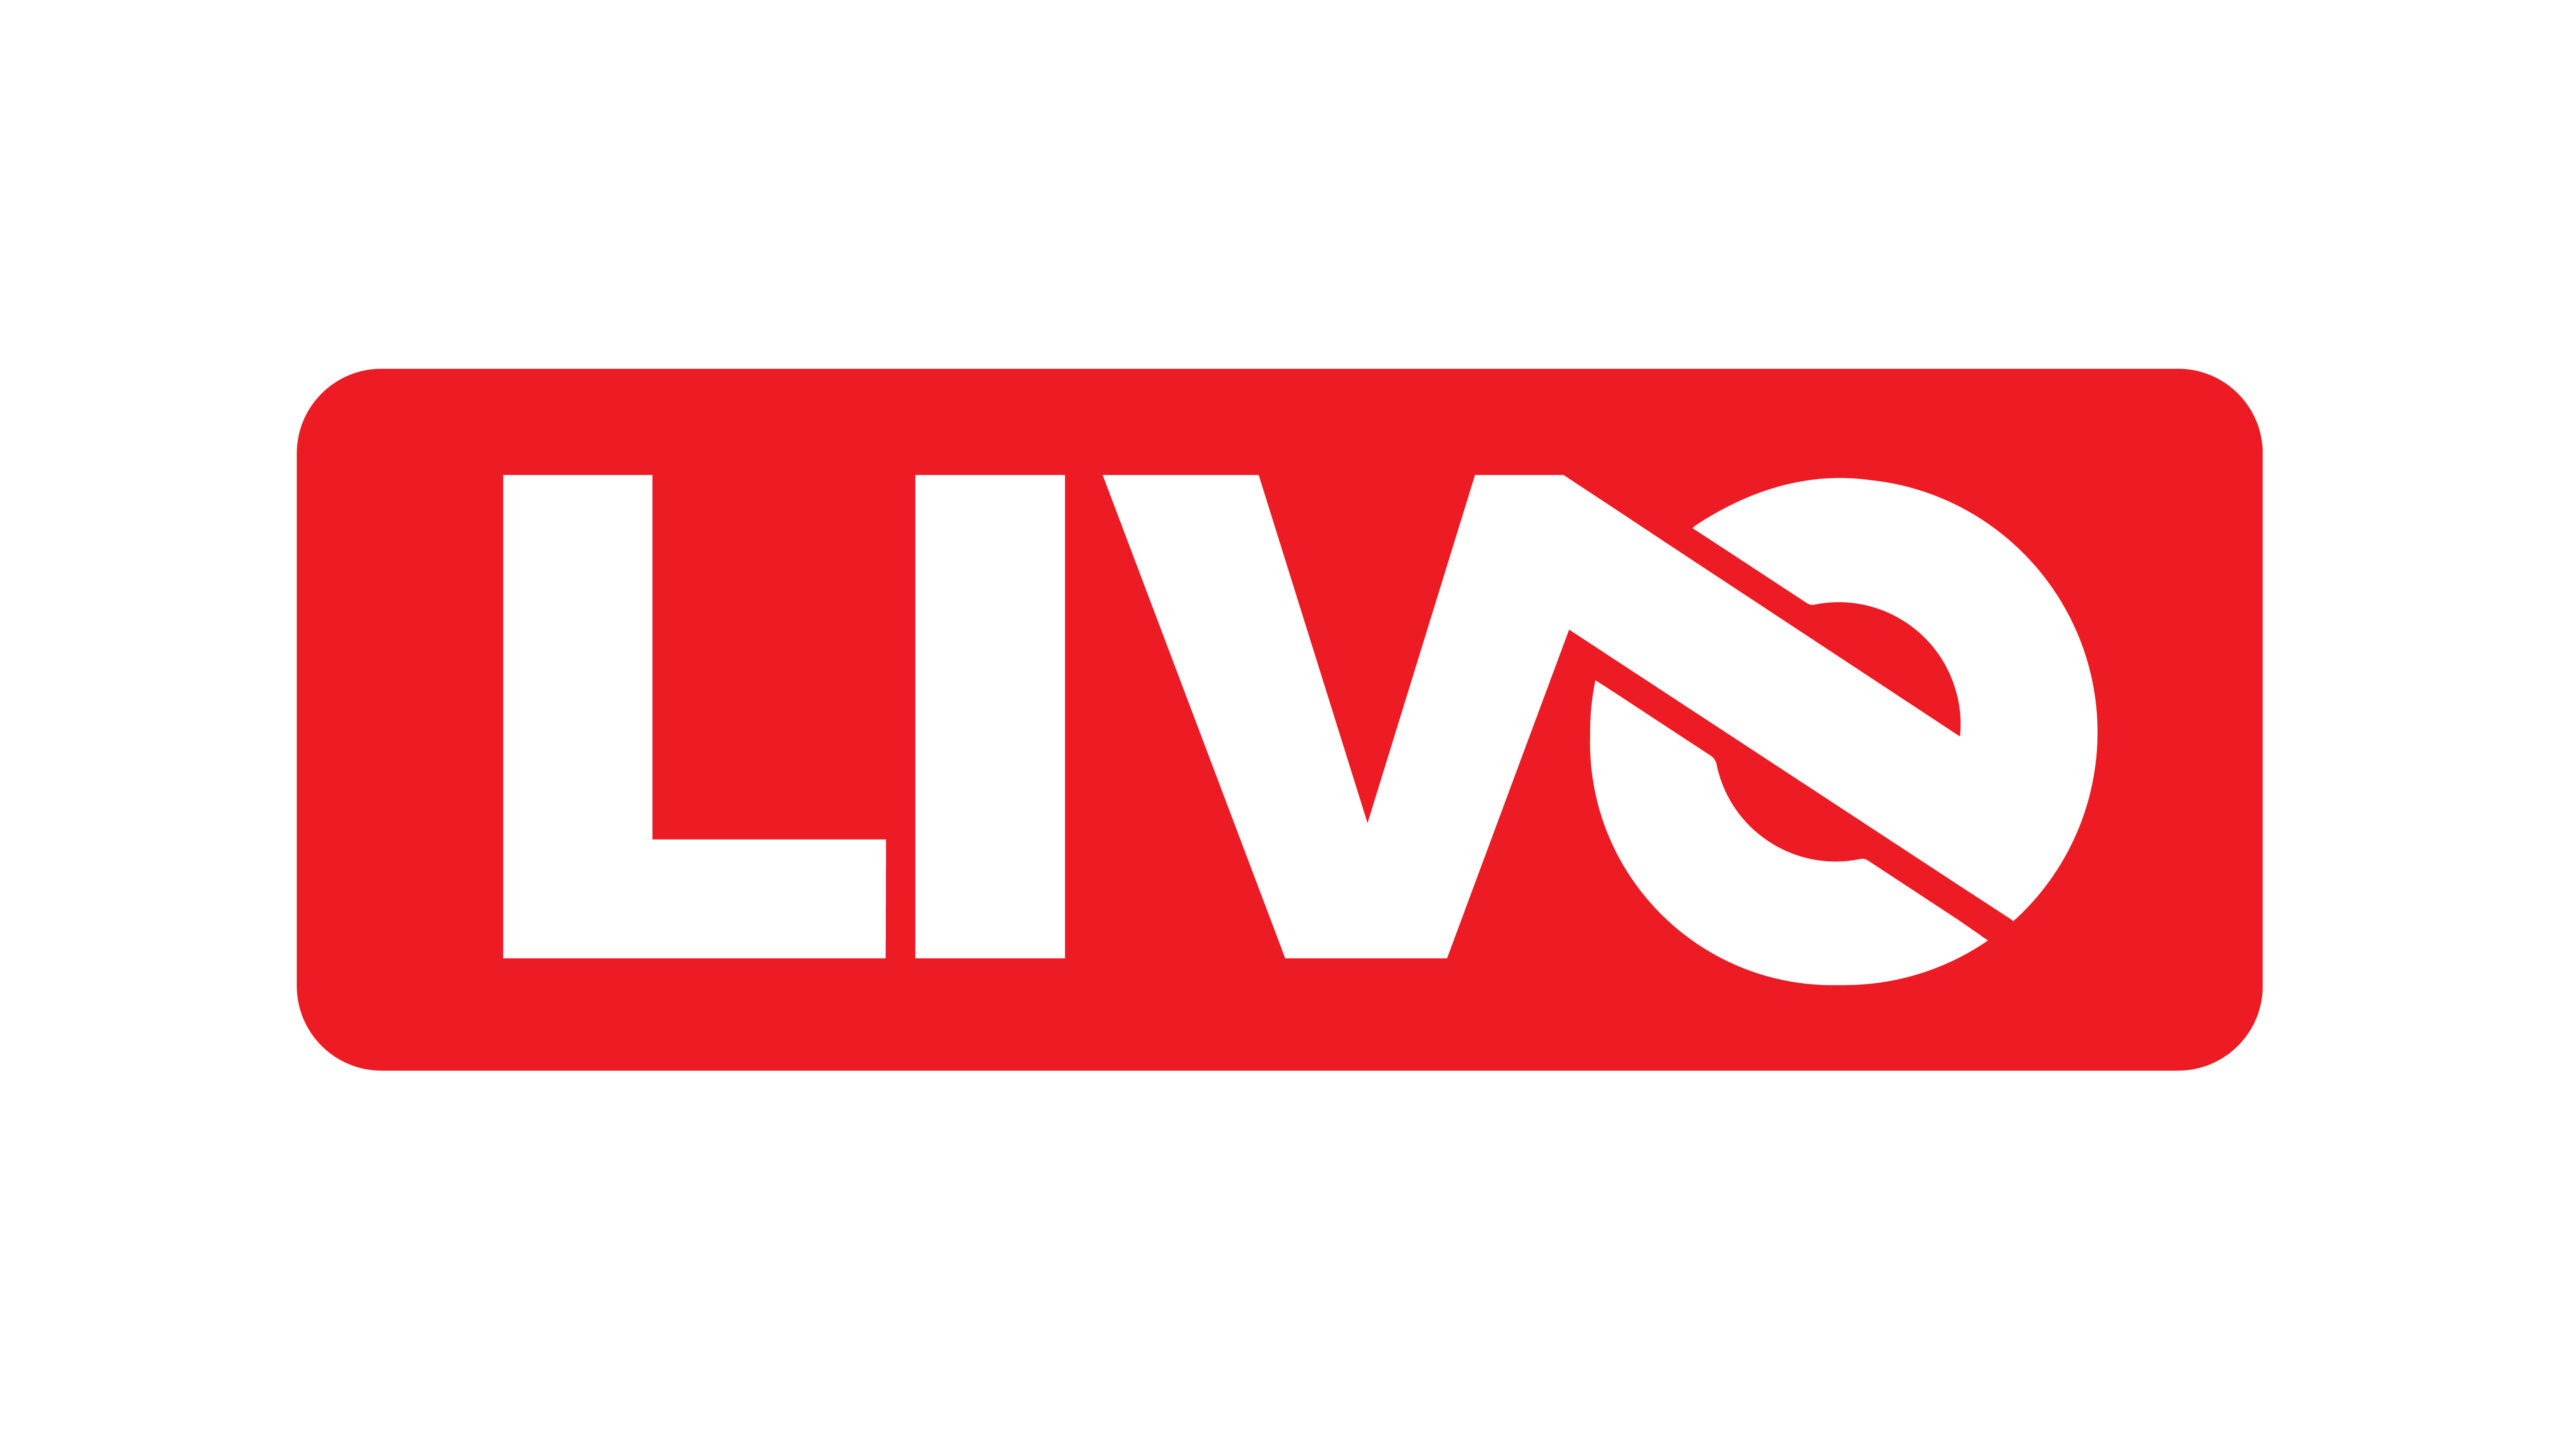 eMense Live